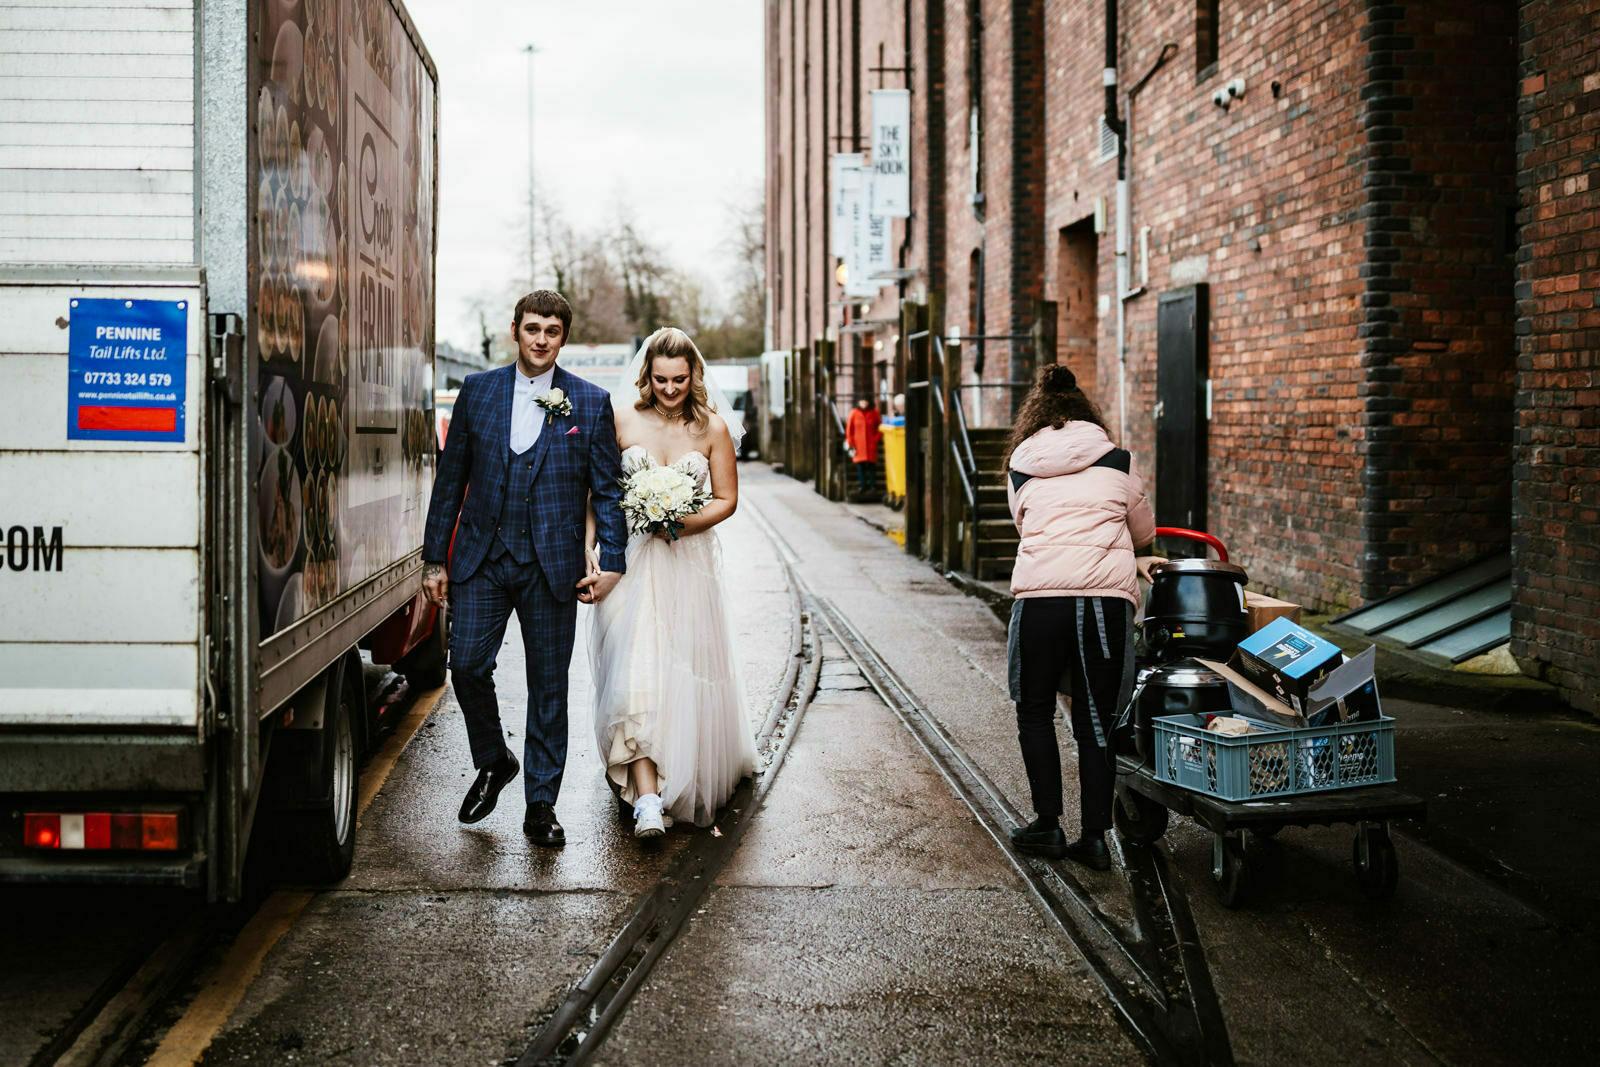 Victoria Warehouse weddings